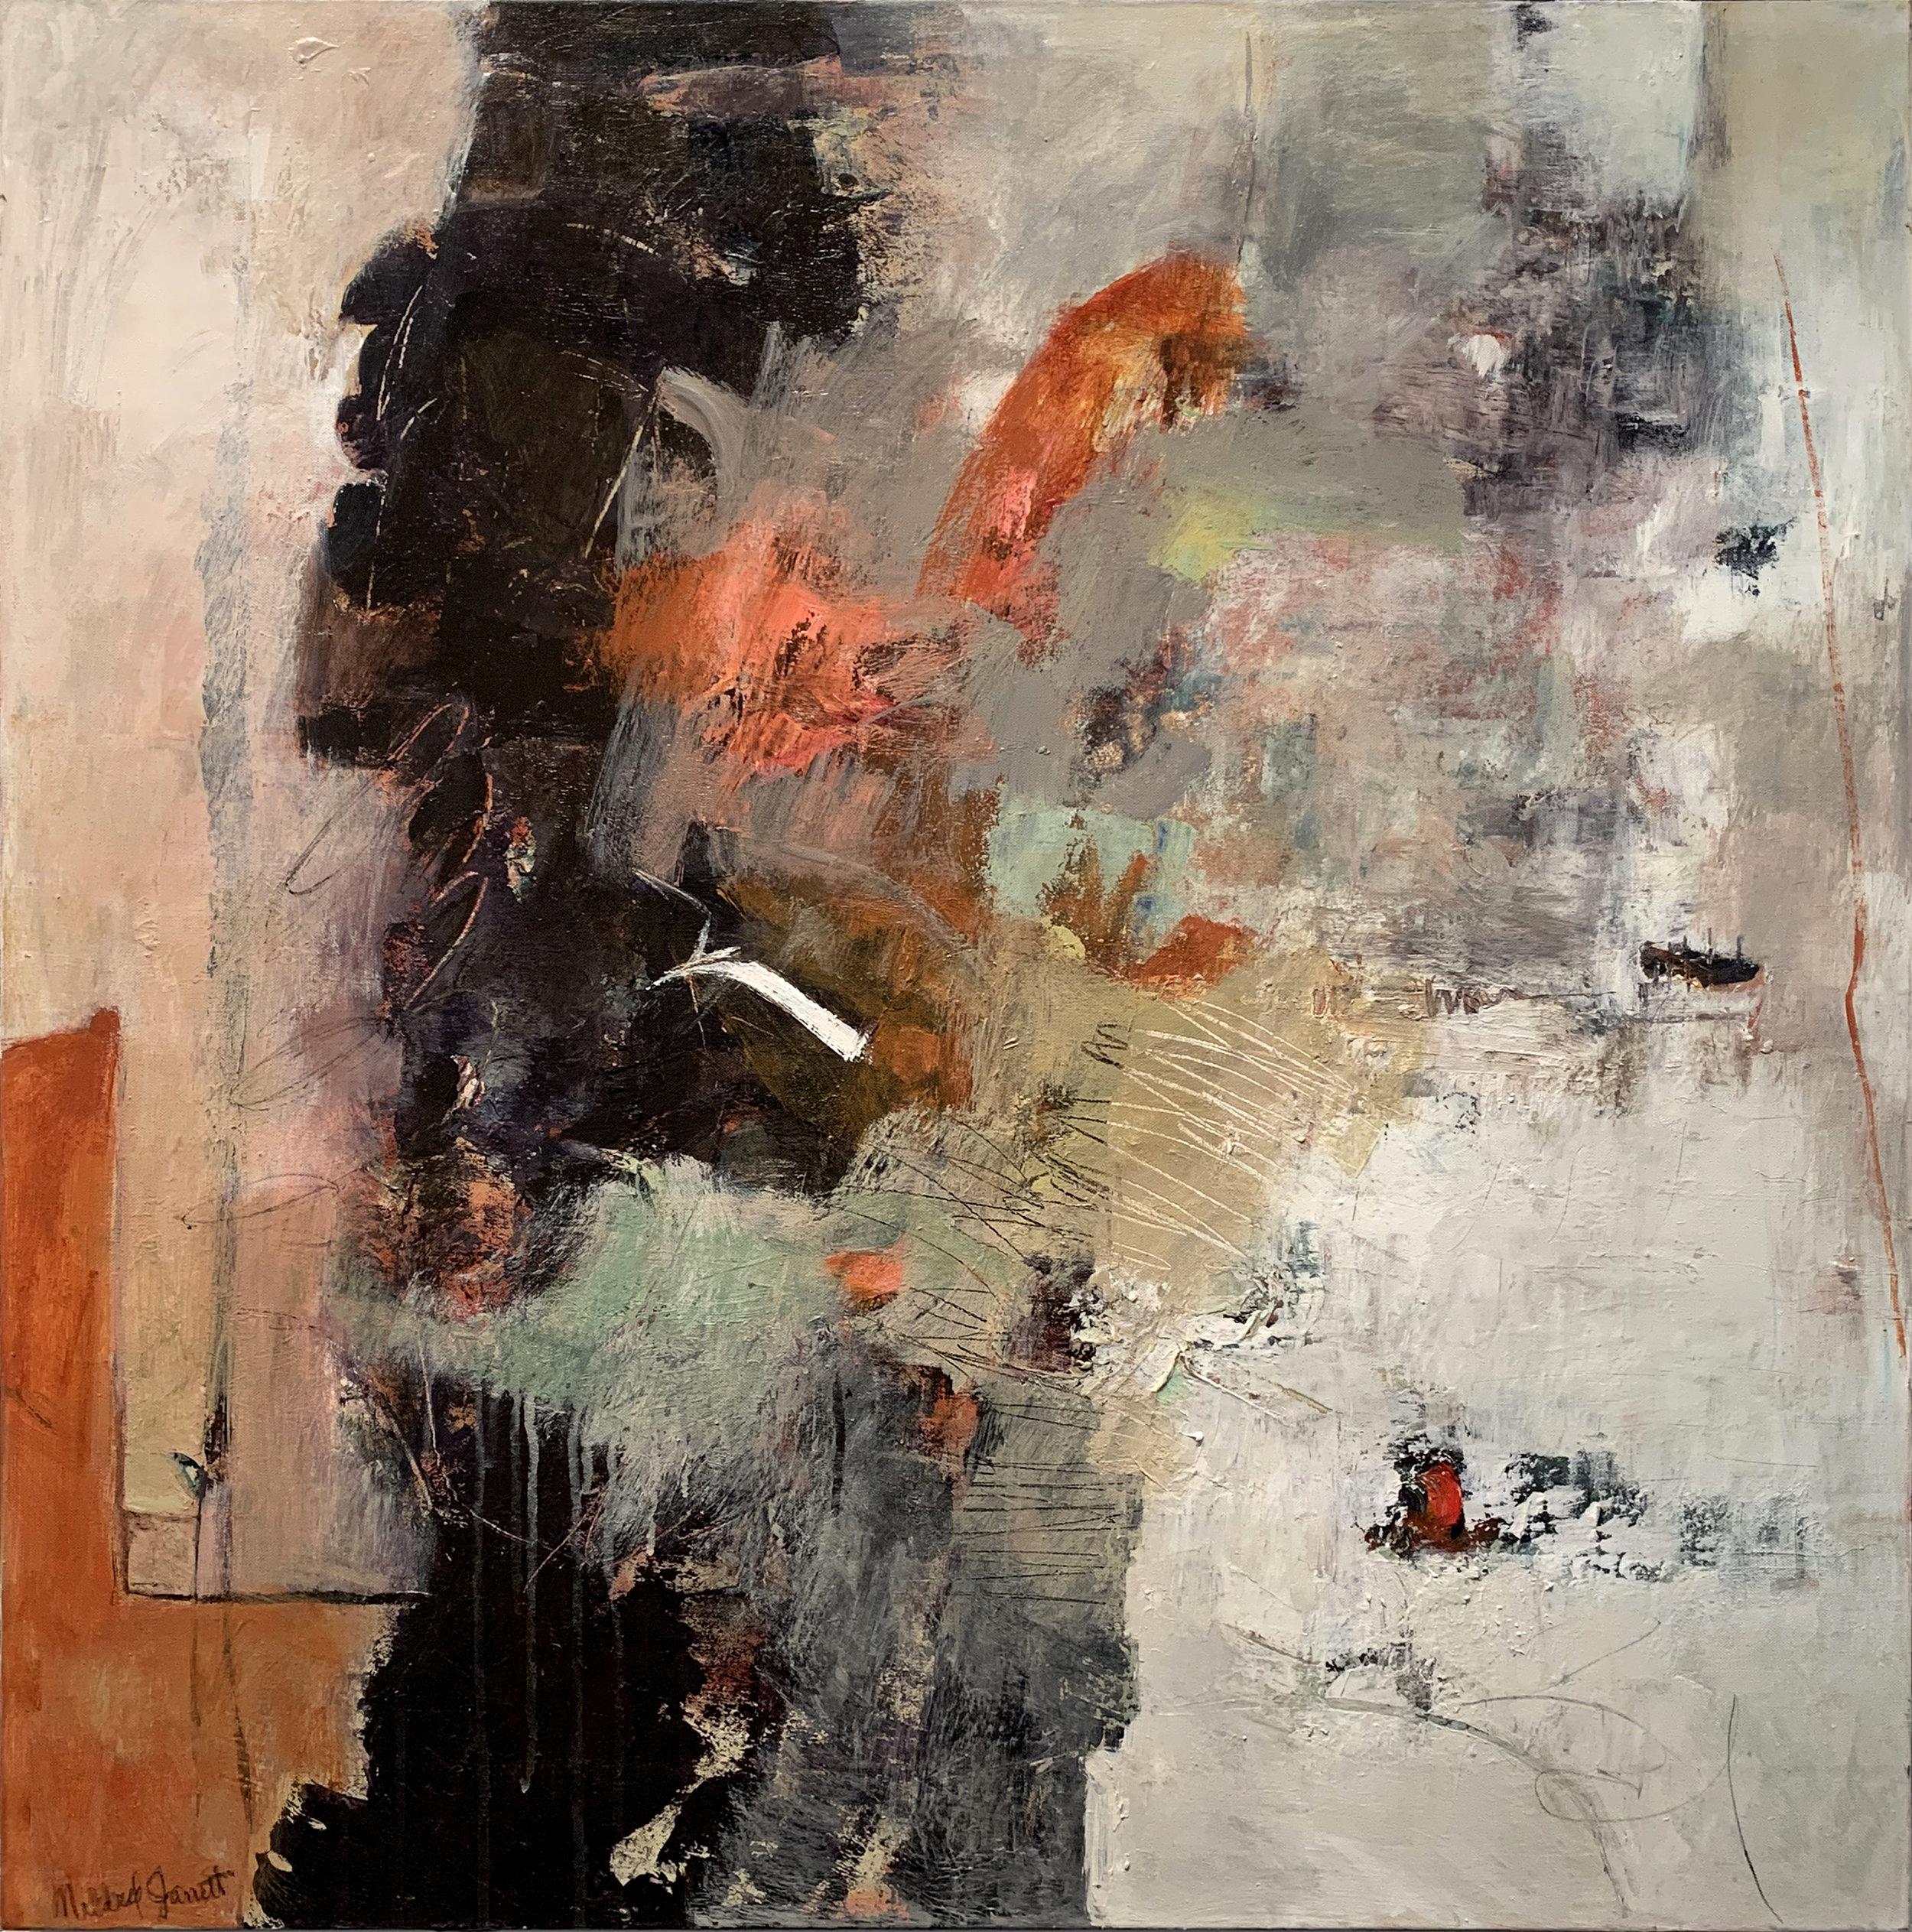 Mildred Jarrett Suspirations of Order Oil on canvas 36 x 36